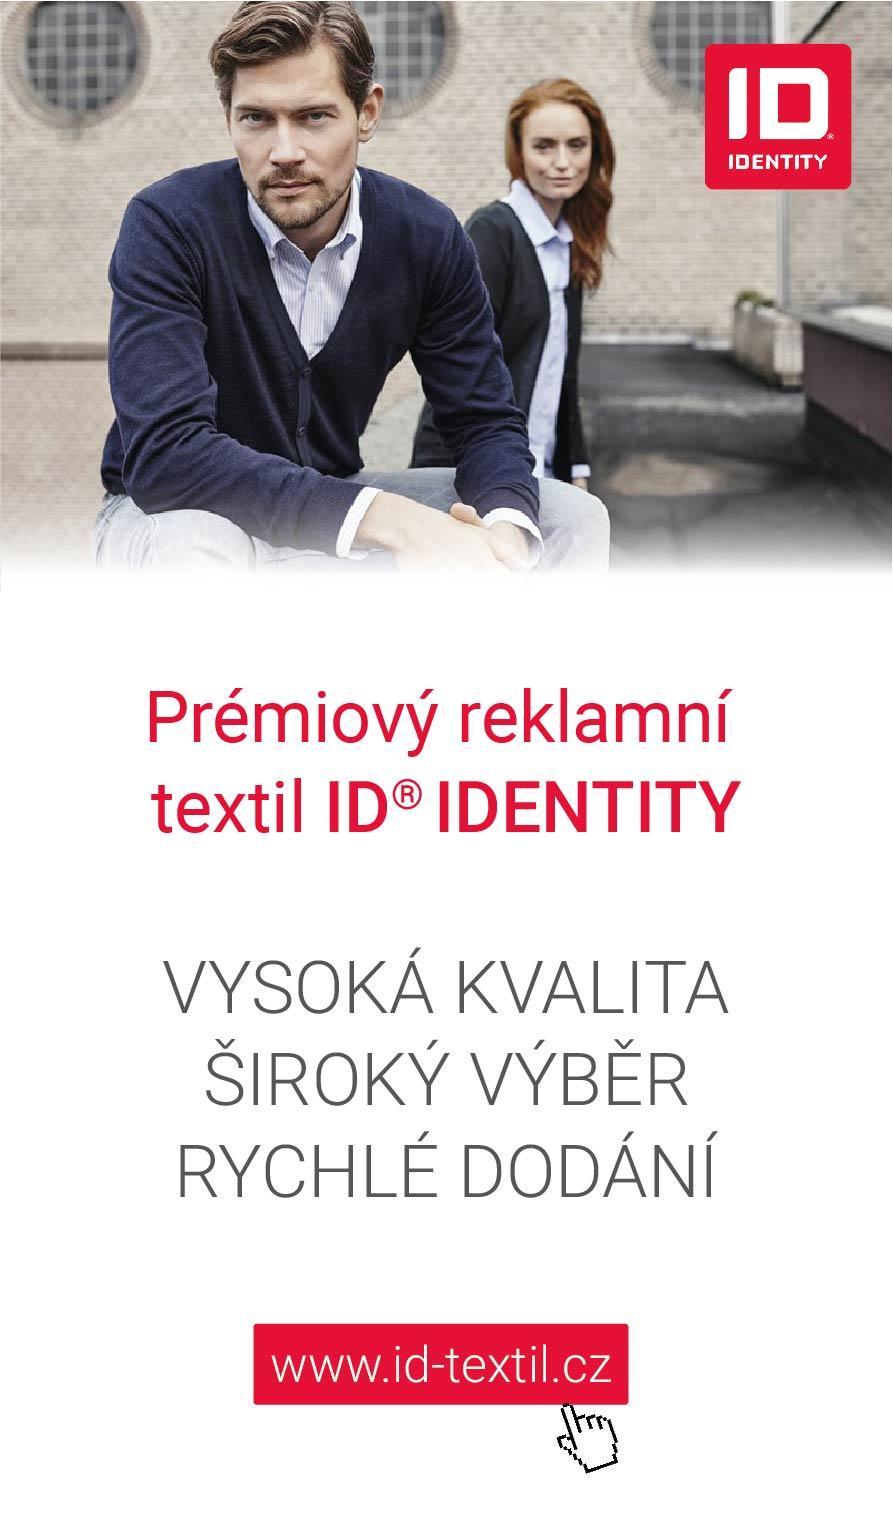 ID Textil banner